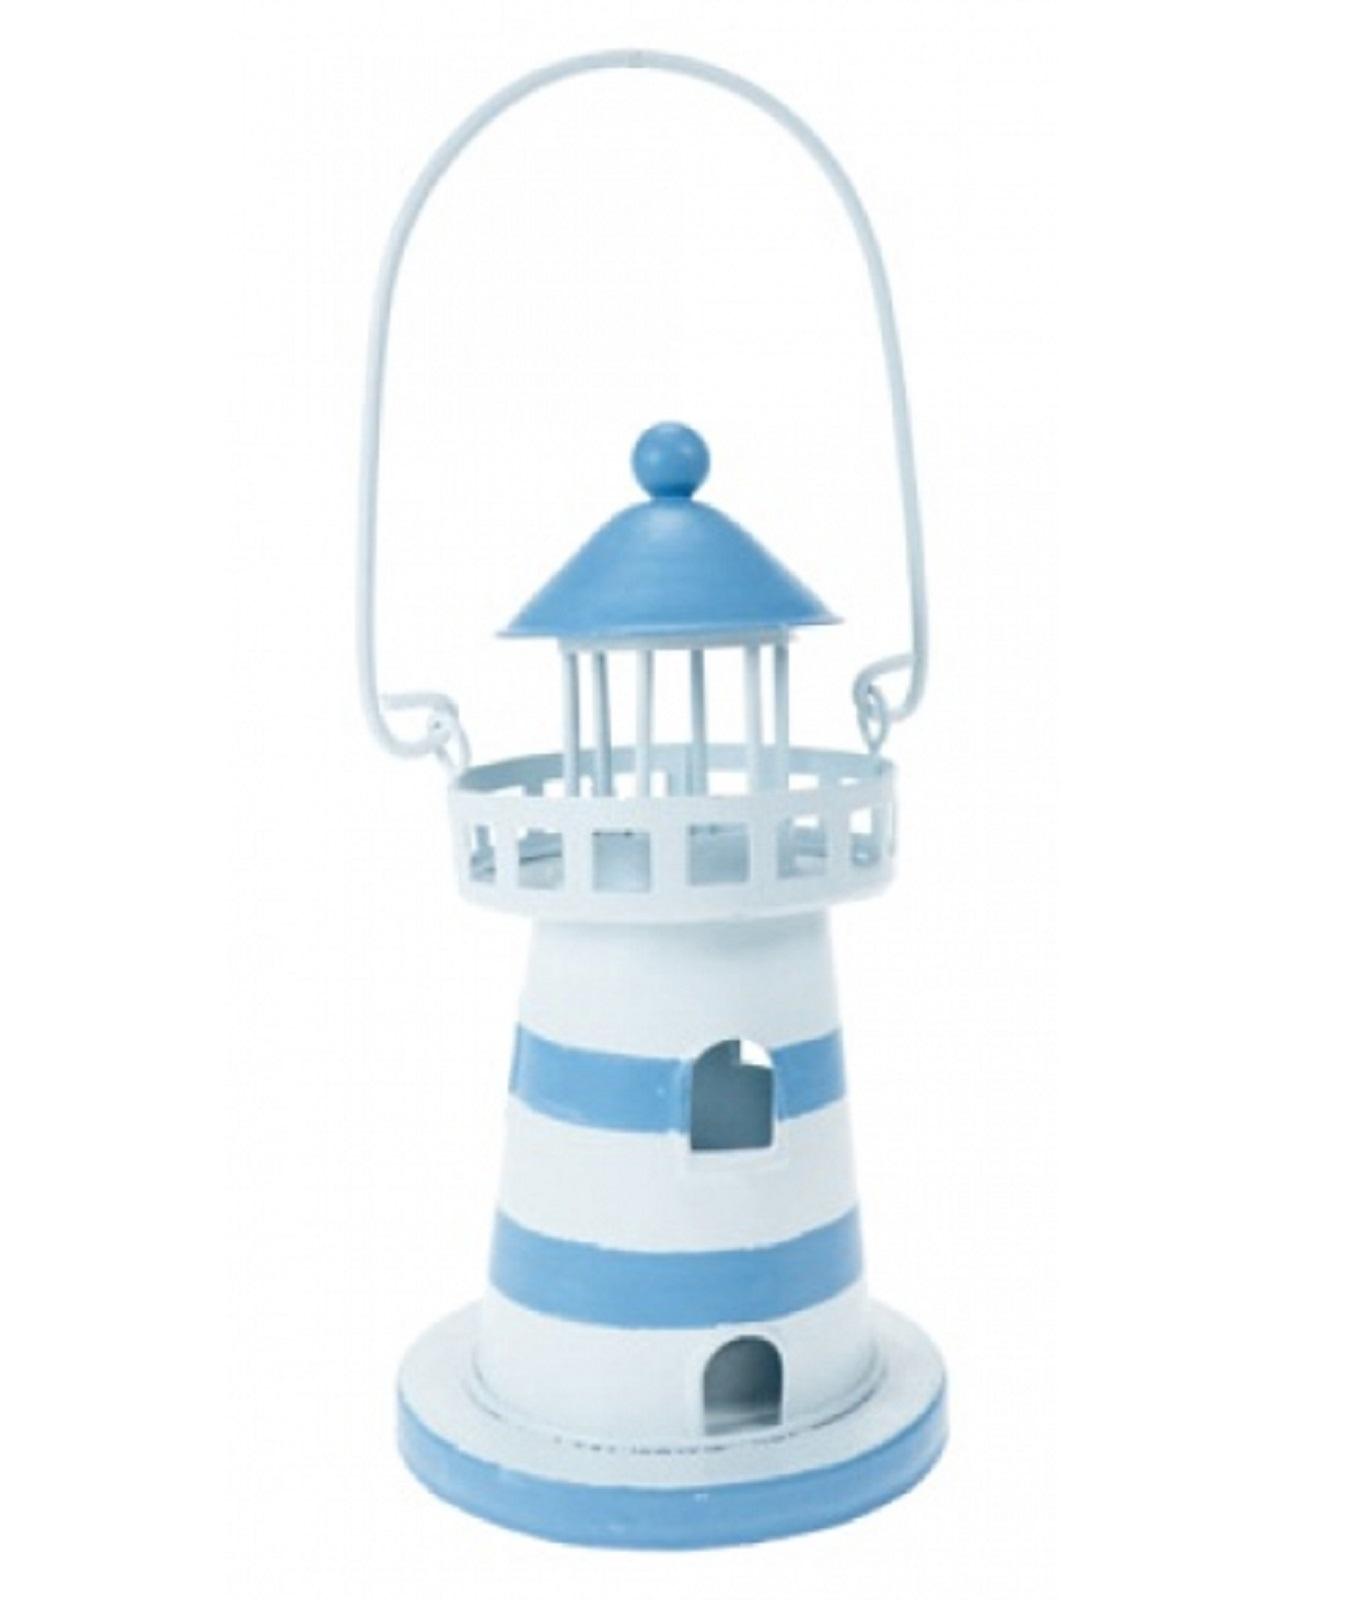 Nautical Decor / Light / Lantern / Small / Lighthouse / Tea Light